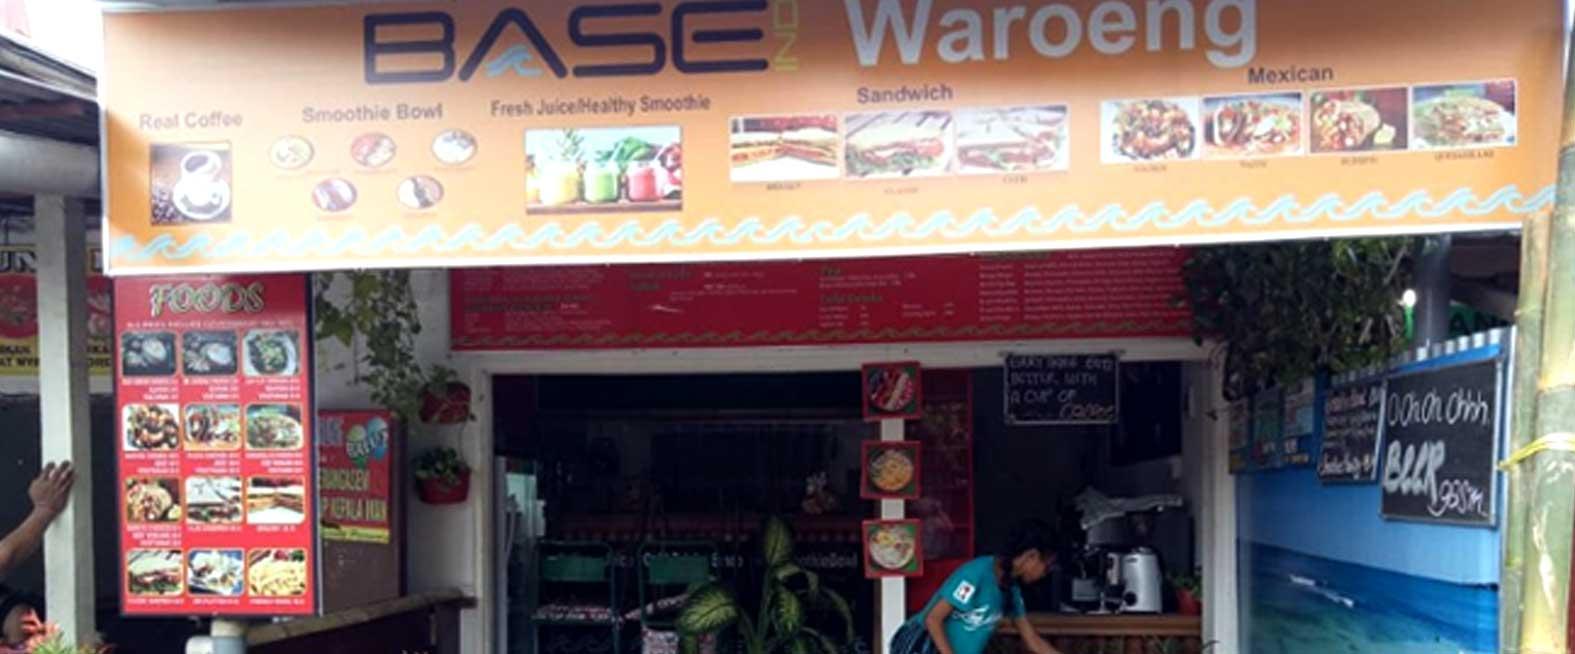 Base Waroeng